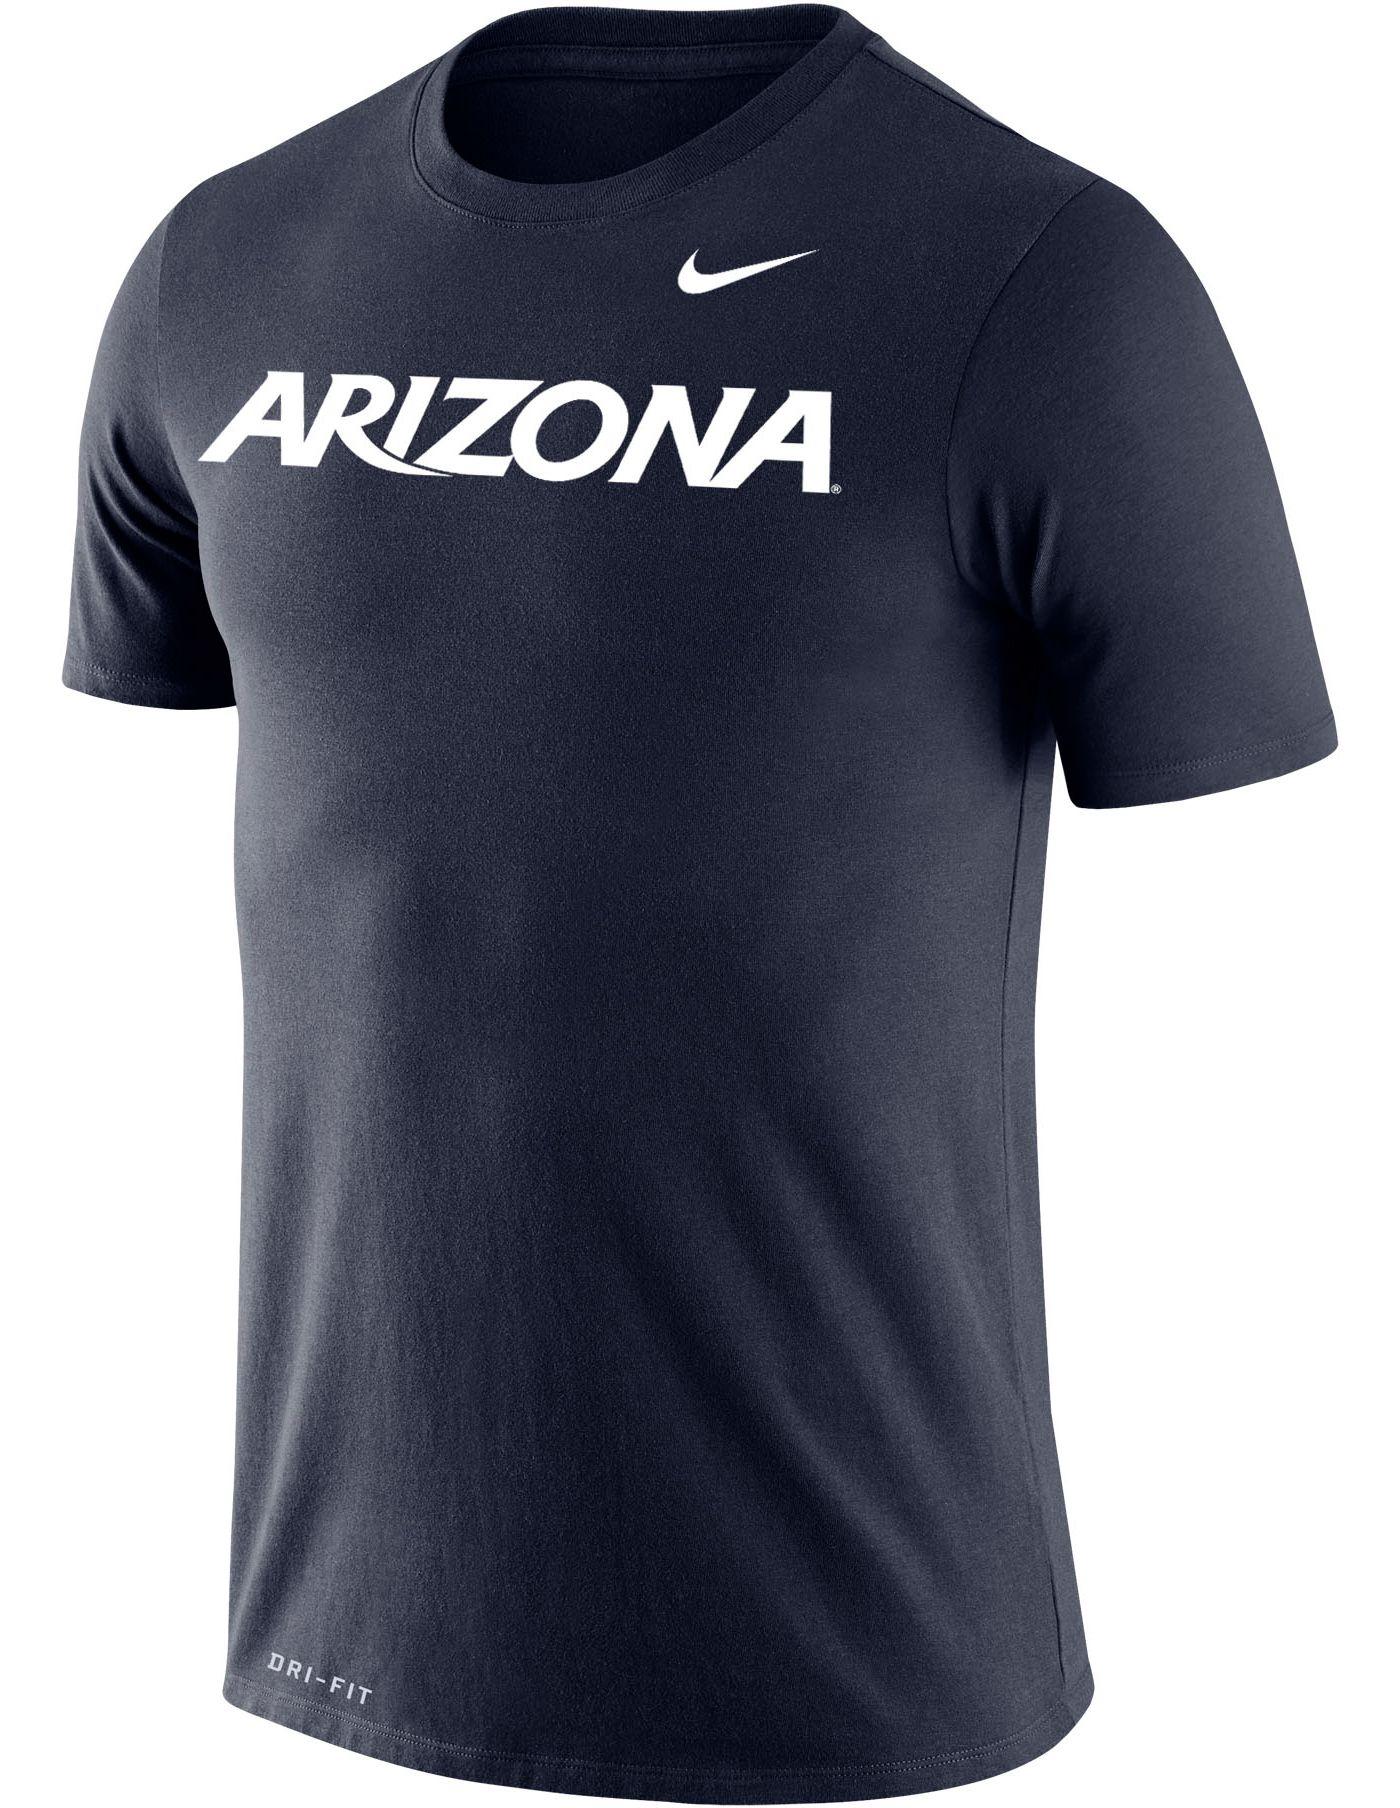 Nike Men's Arizona Wildcats Navy Dri-FIT Cotton Word T-Shirt